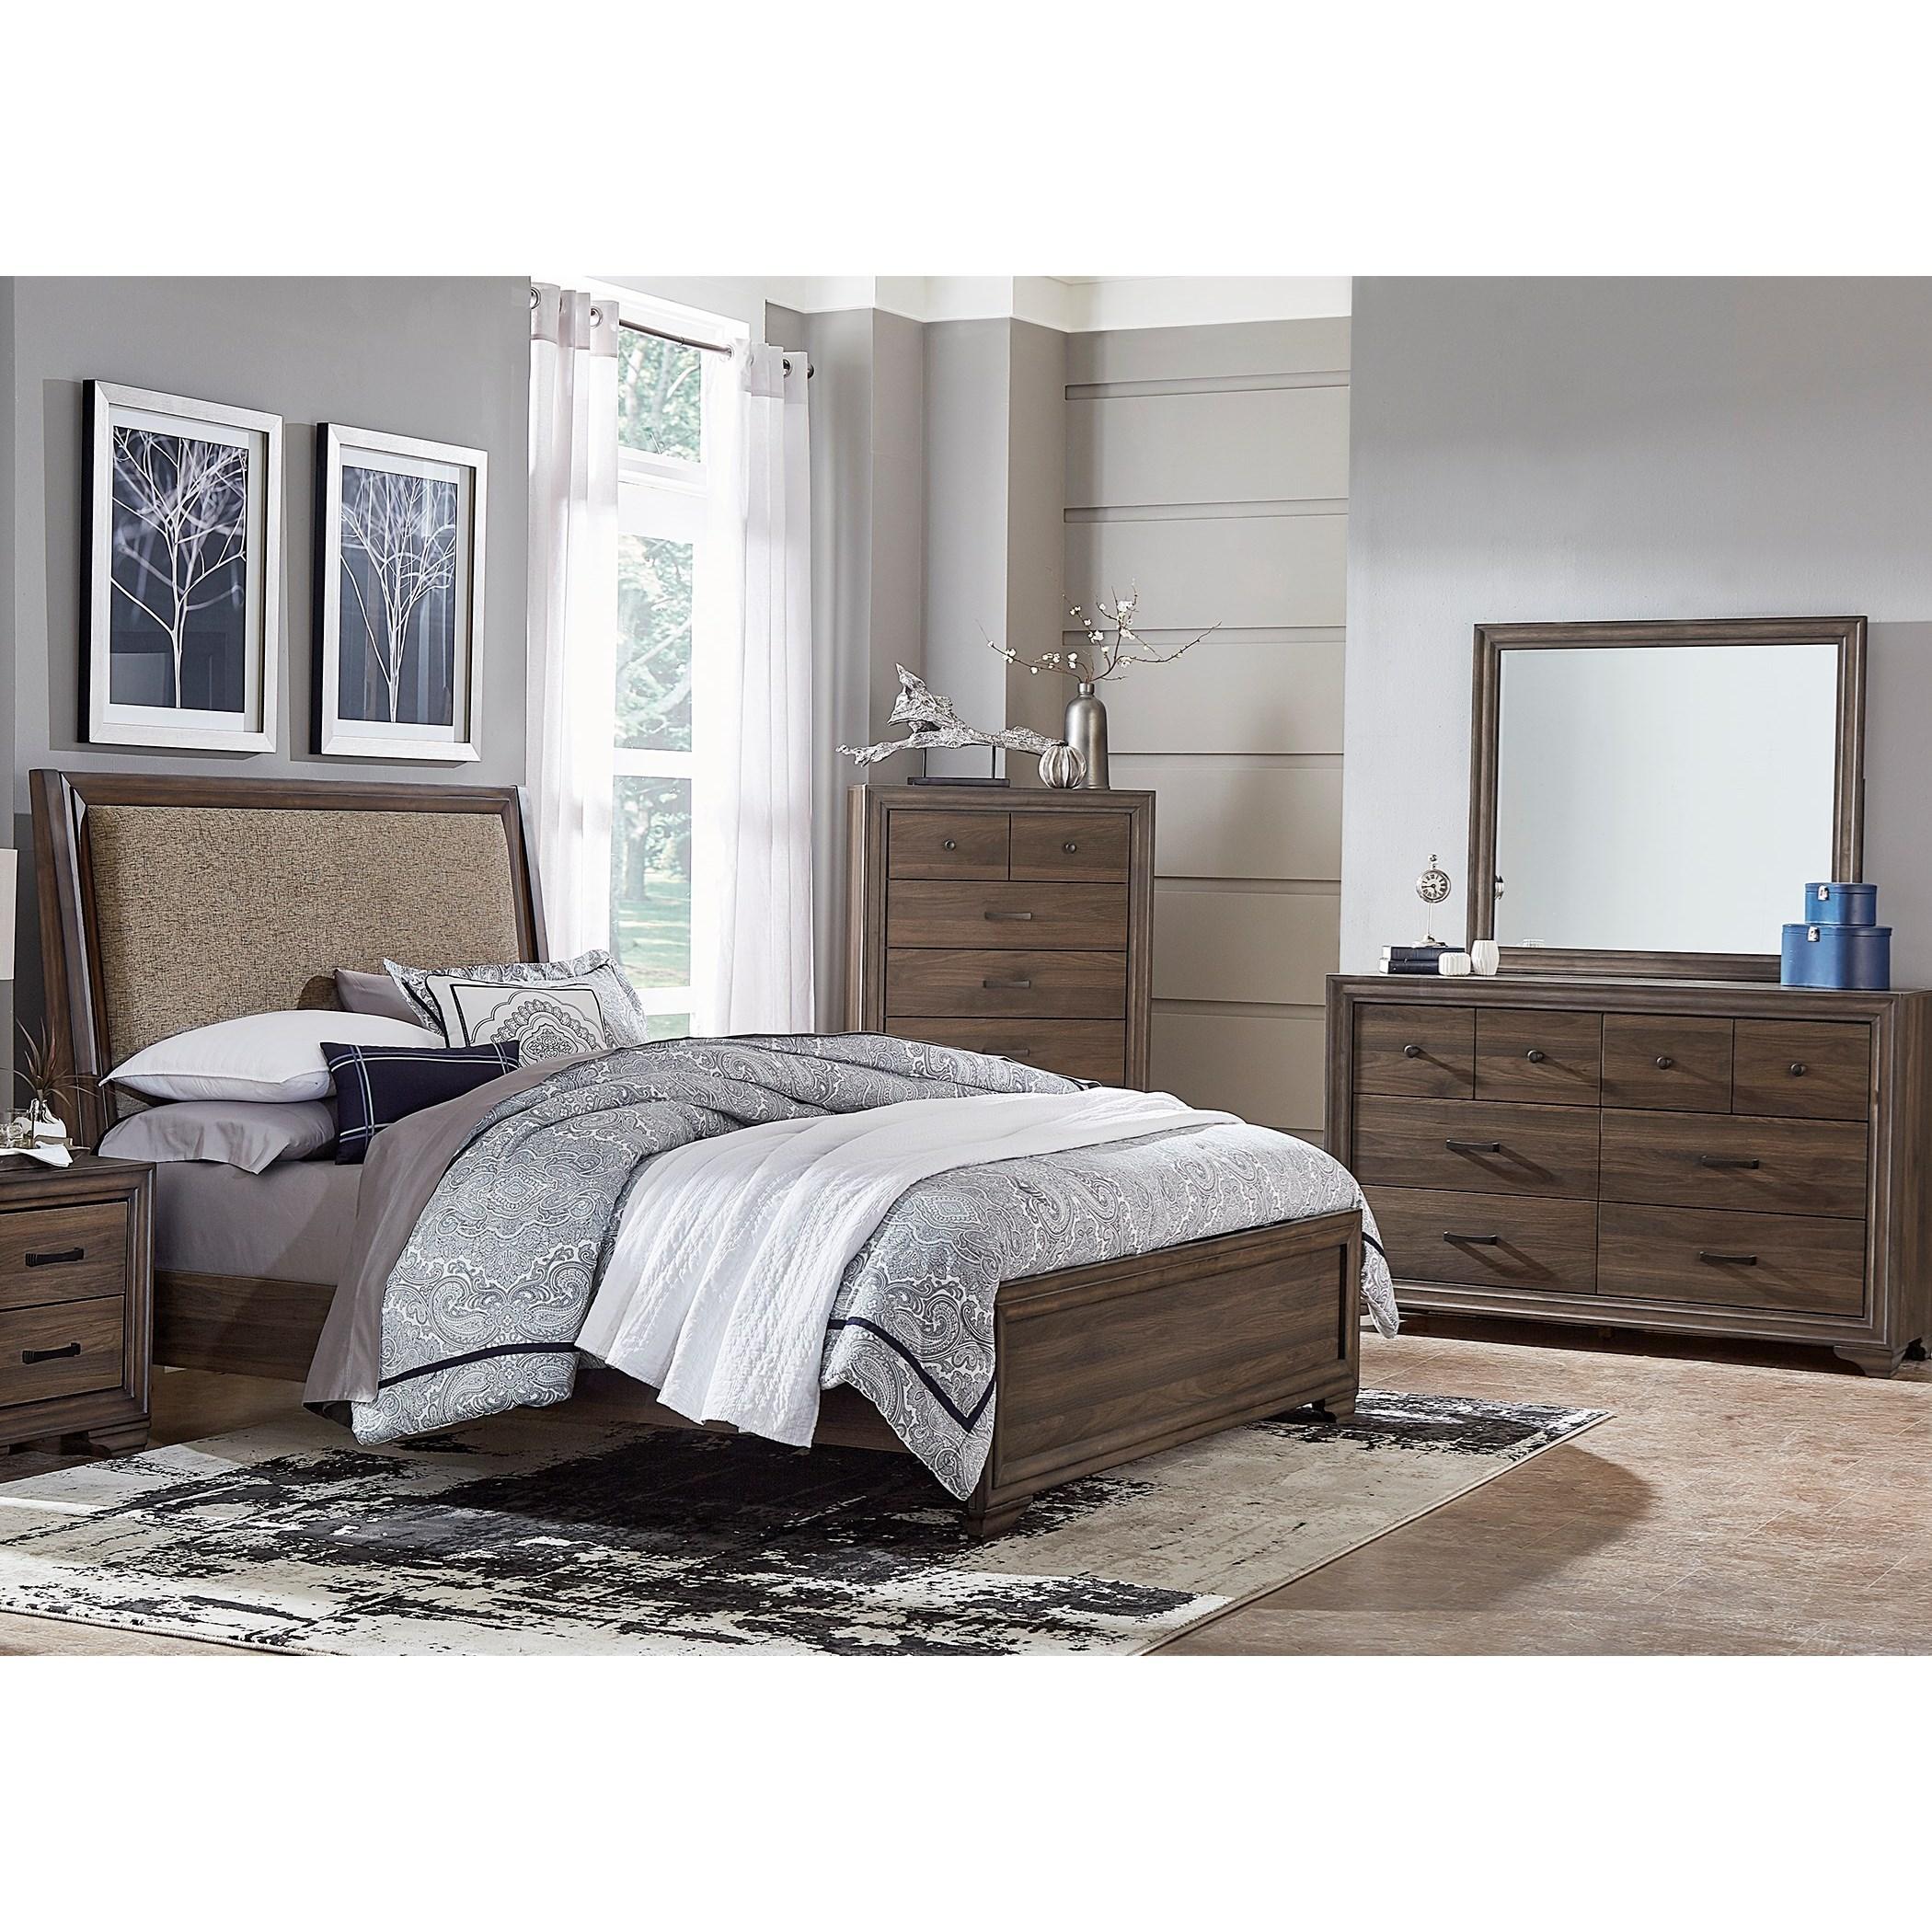 Liberty Furniture Clarksdale Queen Bedroom Goup - Item Number: 445-BR-QUBDM